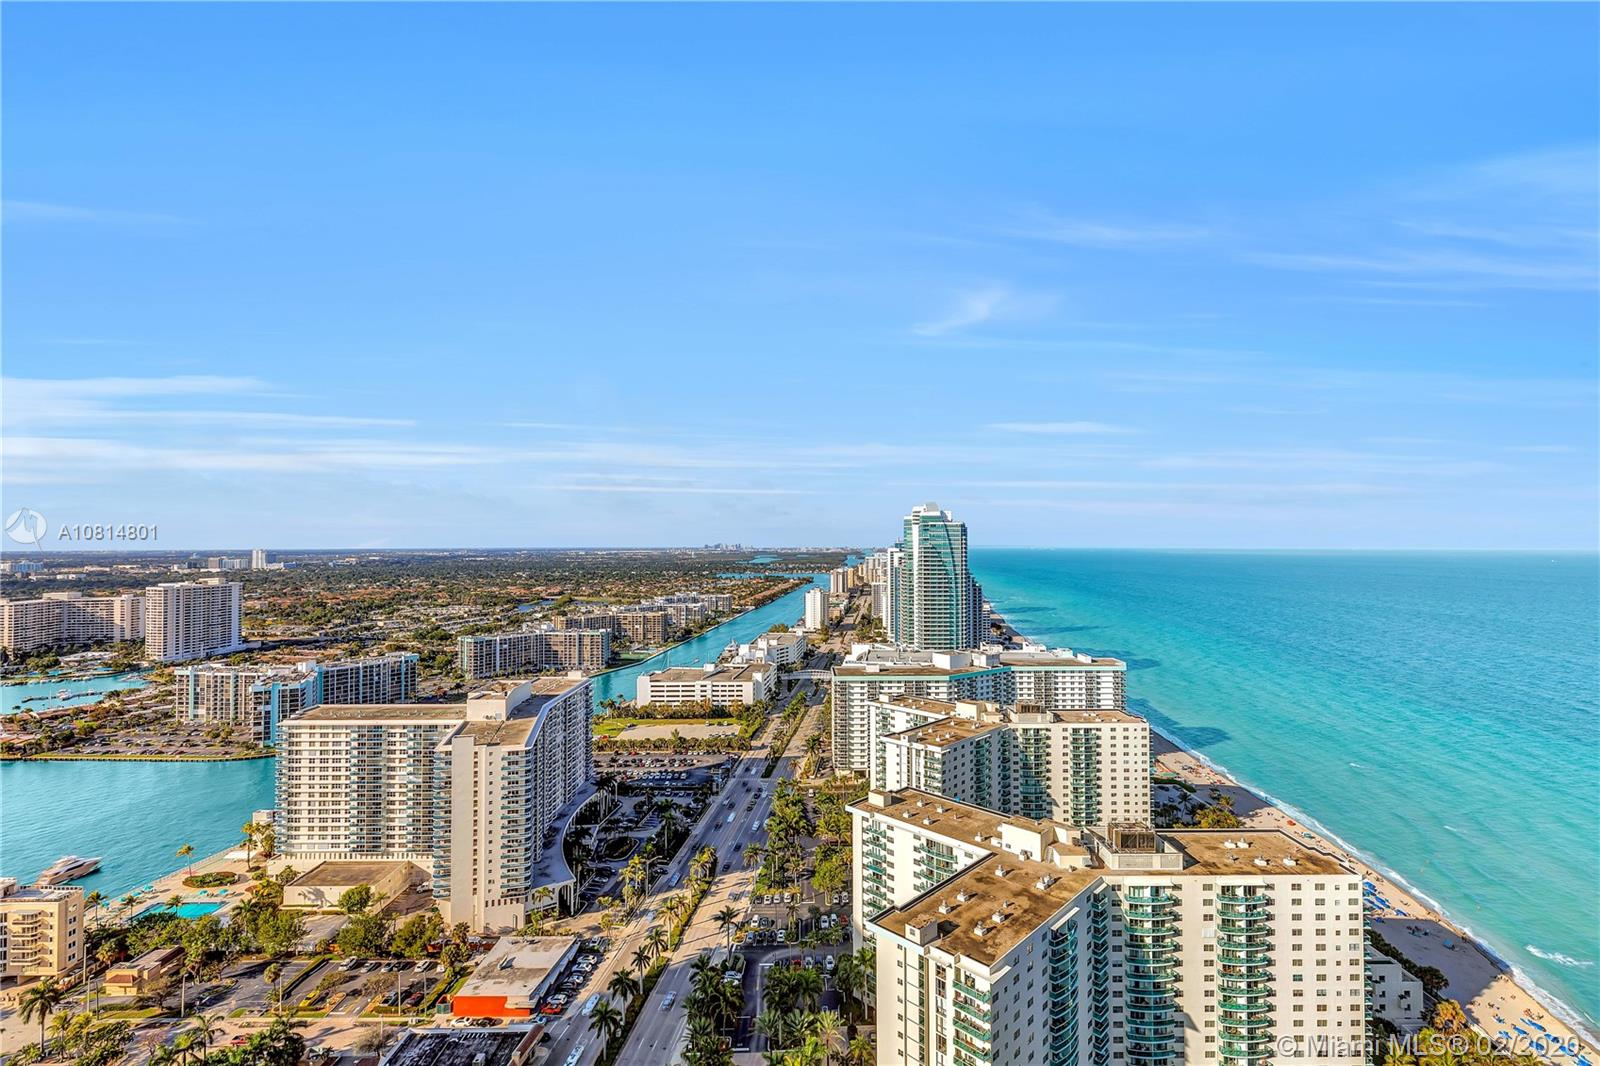 4111 S Ocean Dr, 3208 - Hallandale Beach, Florida